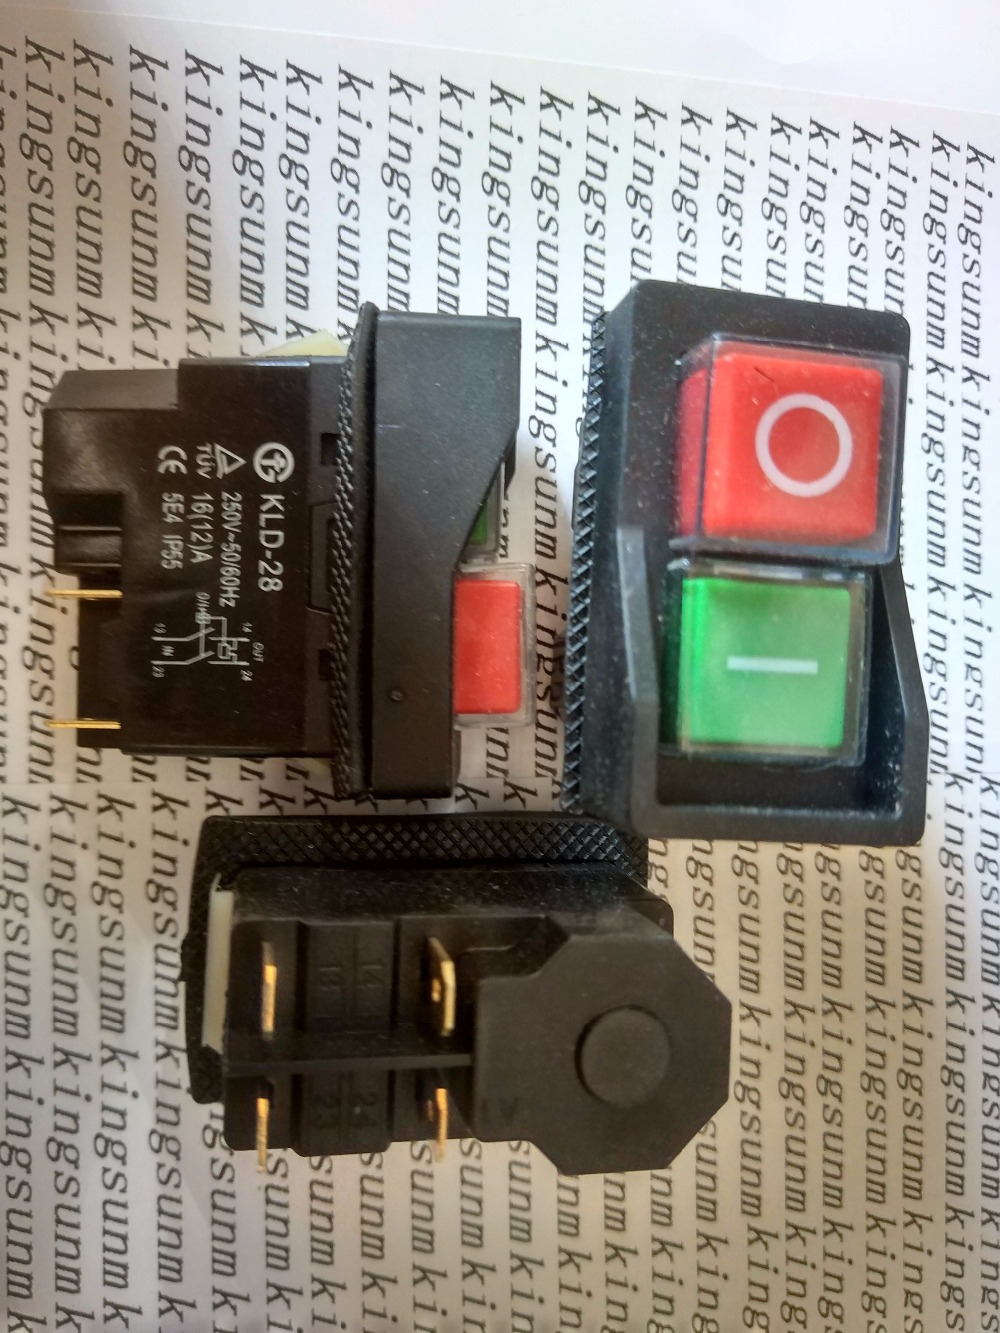 5pcs Magnetic button switch KLD-28A KLD-28 220V waterproof explosion proof KJD17B electromagnetic switch a b art kld 107